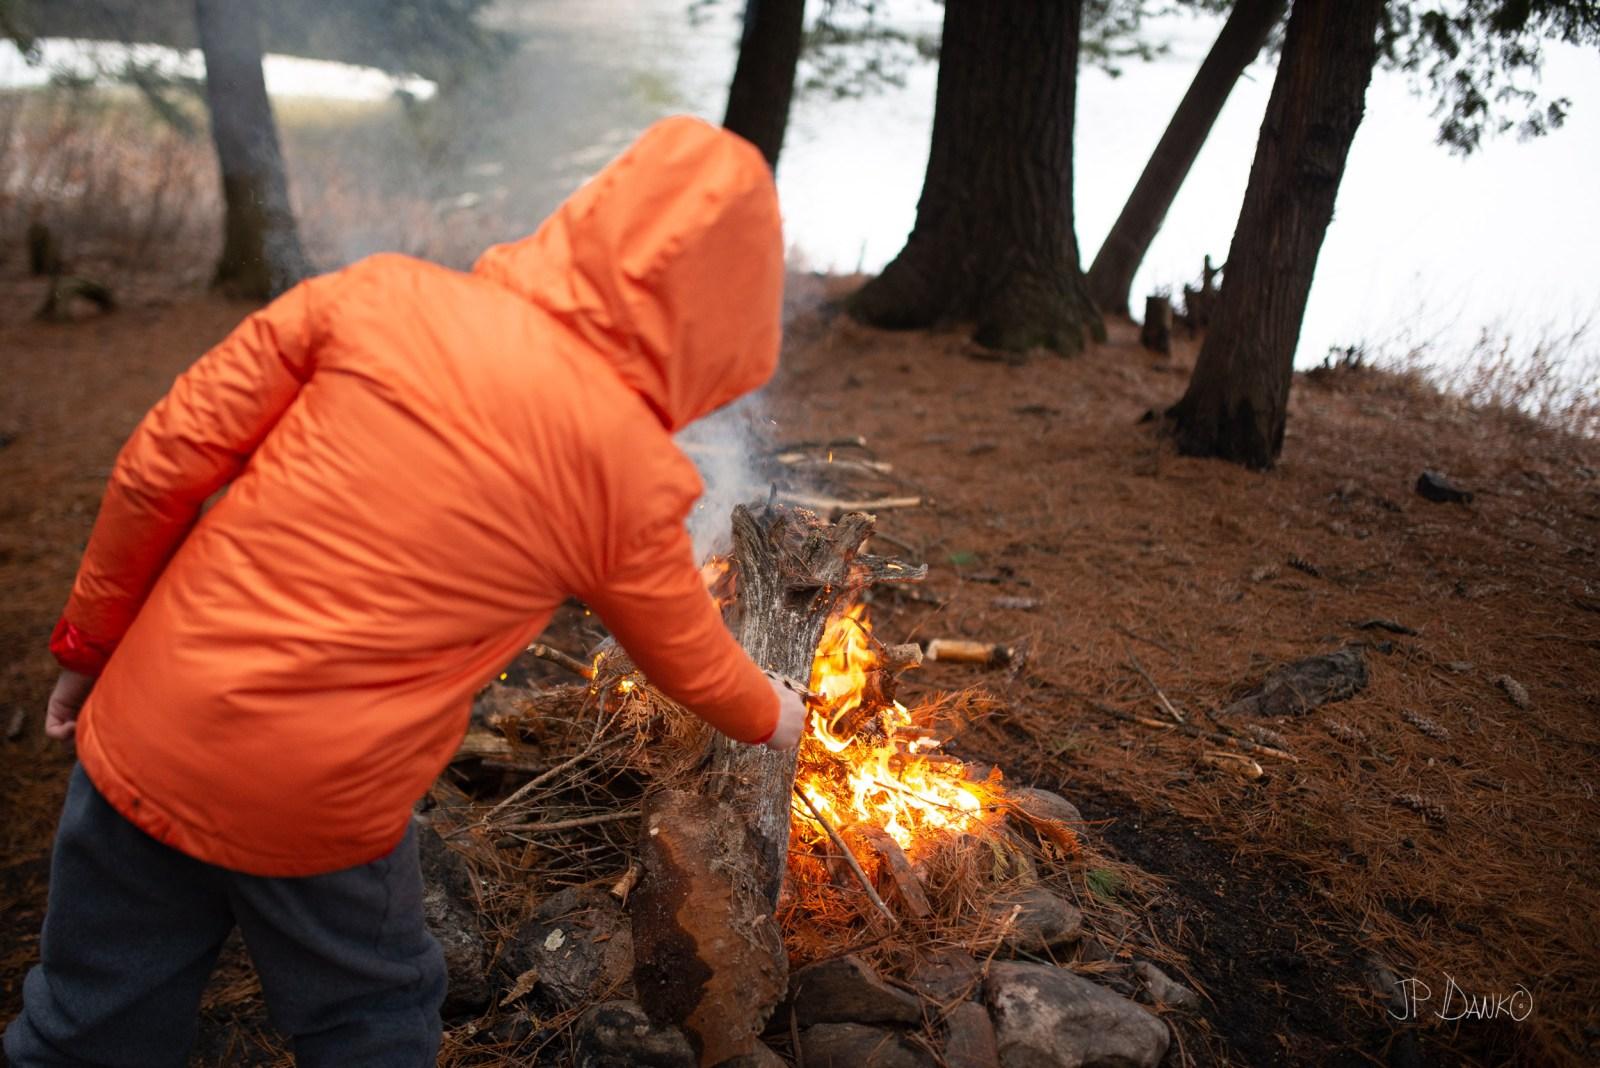 Boy Campfire Spring Canoe Trip Backcountry Wilderness Camping